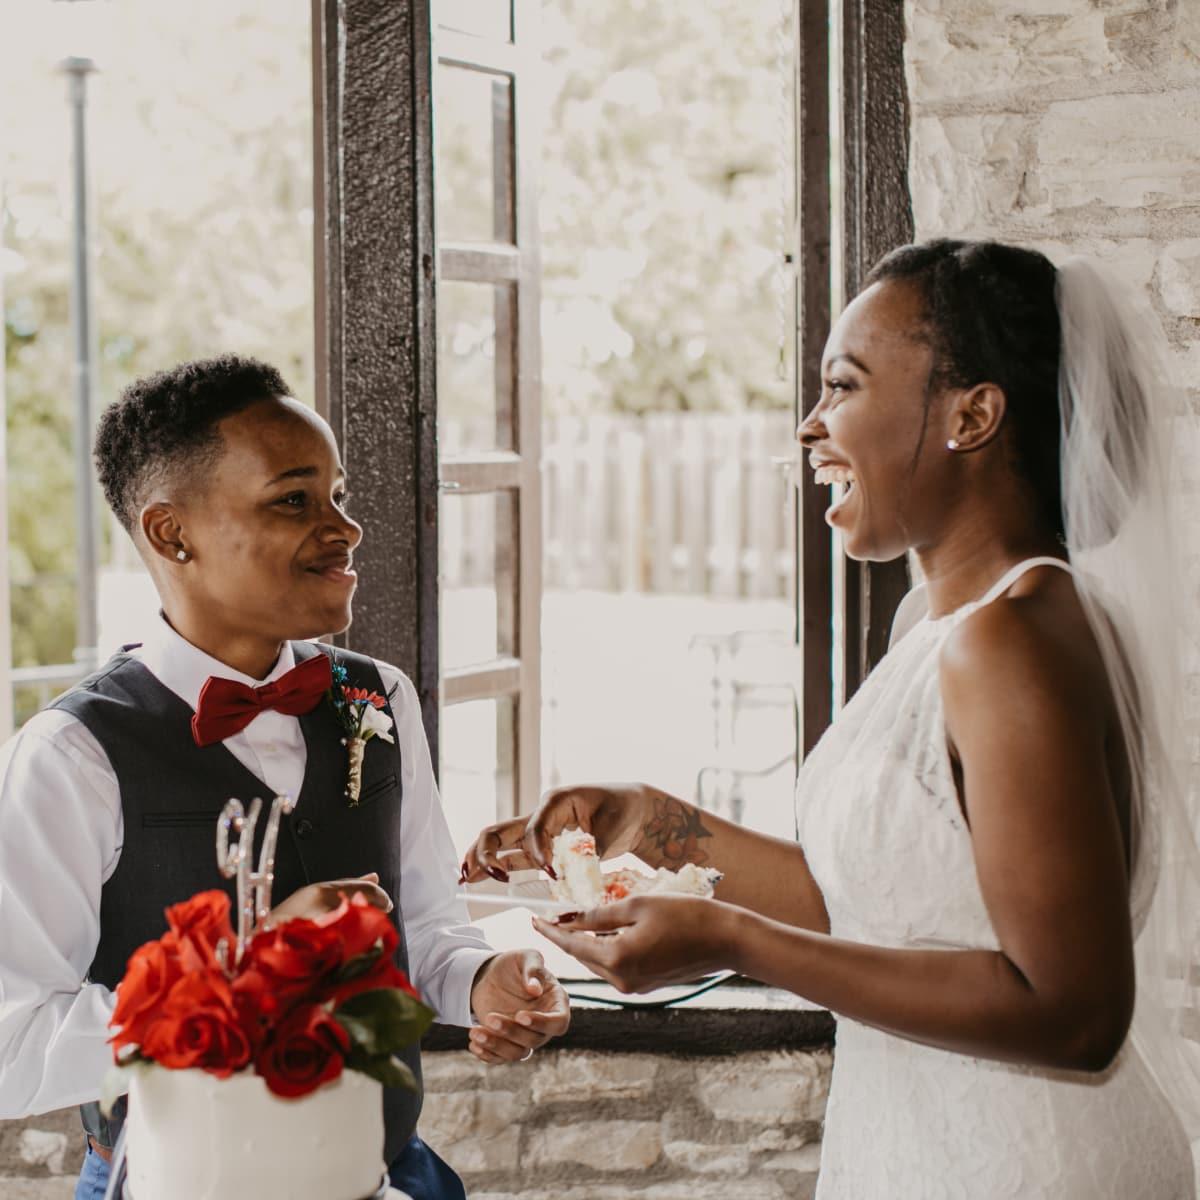 Jazmine Henderson and Shantel Woods wedding